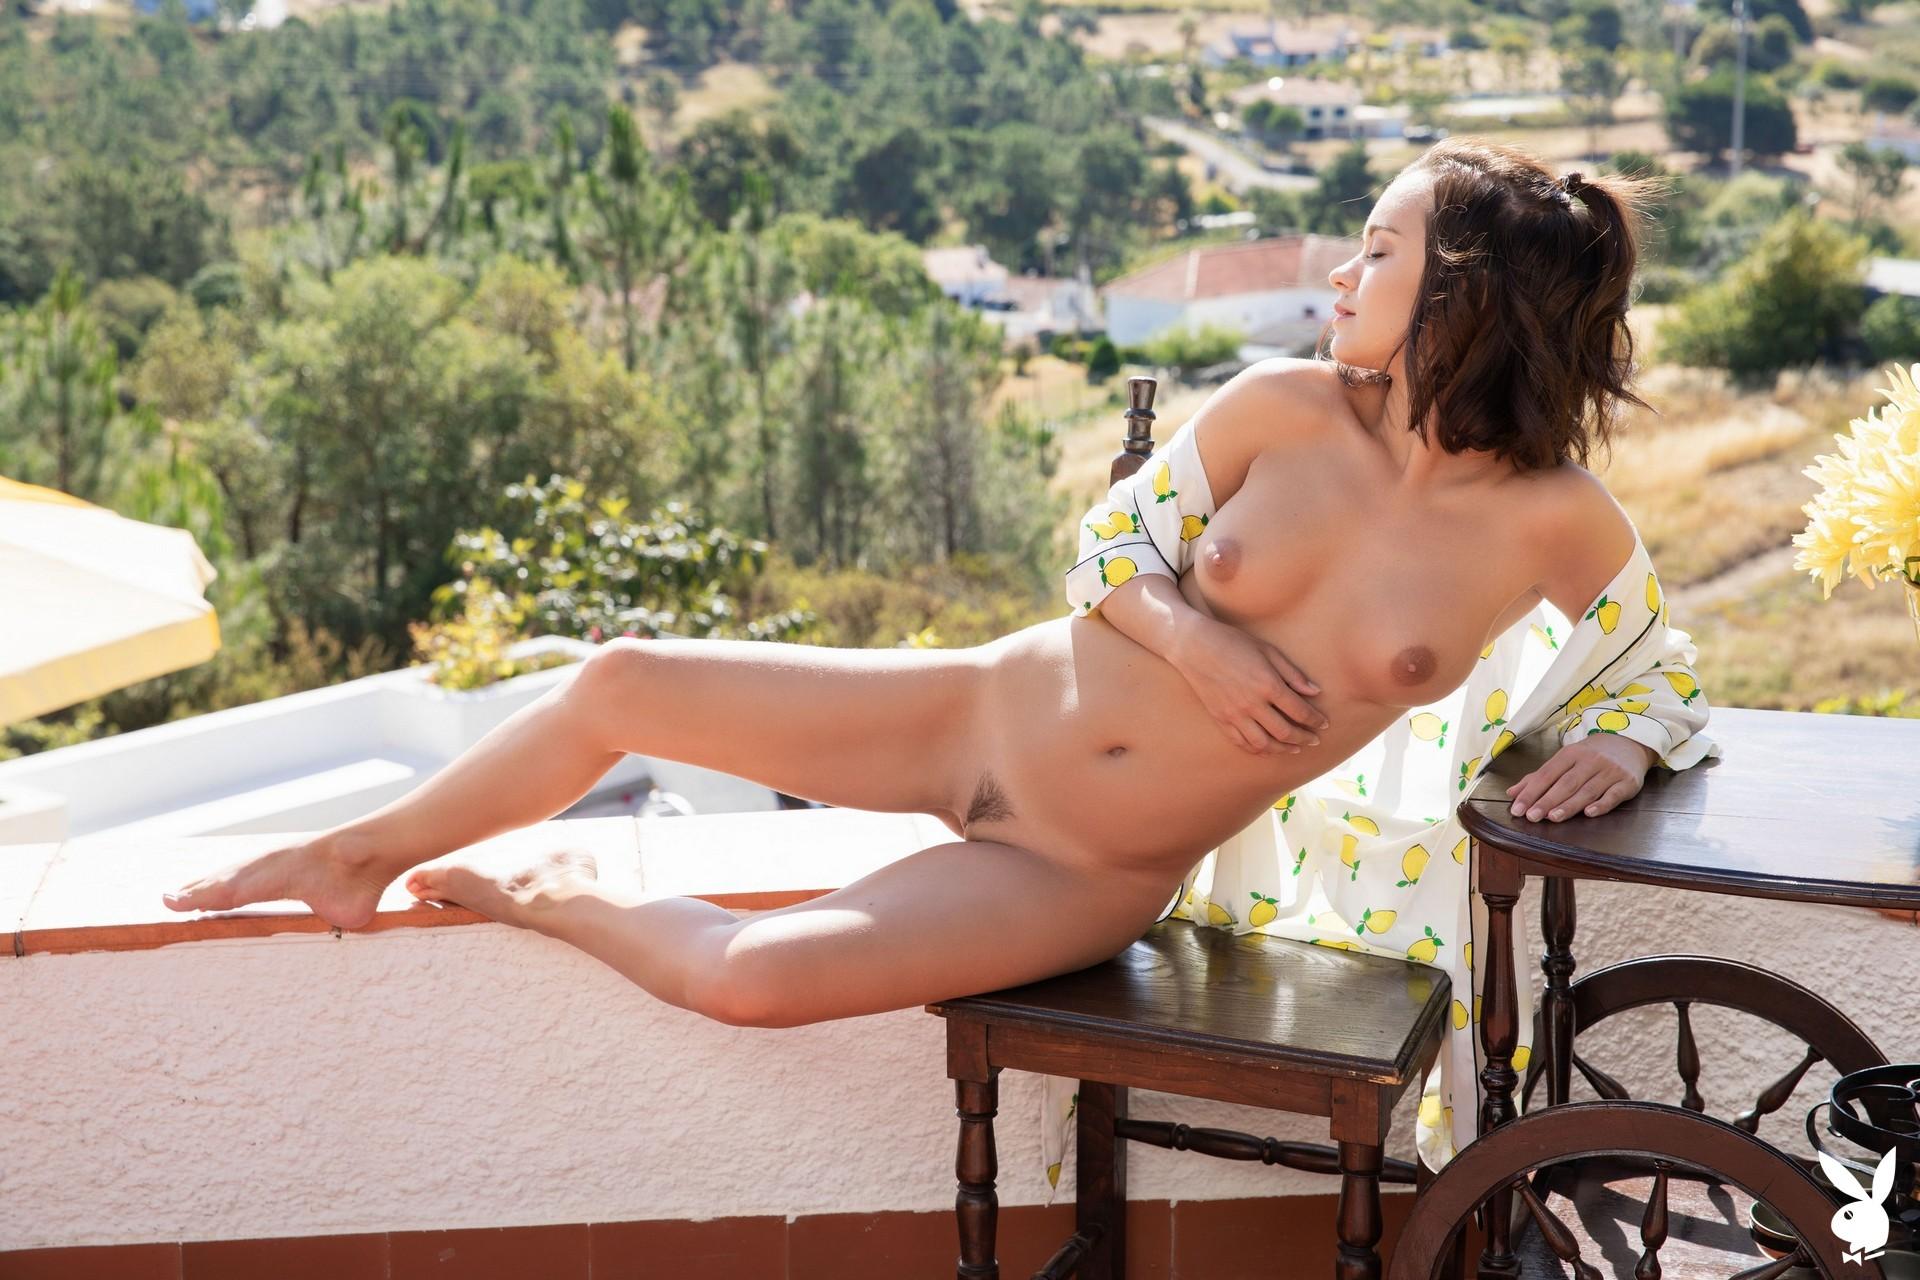 Marine Lecourt In Country Summit Playboy Plus (13)